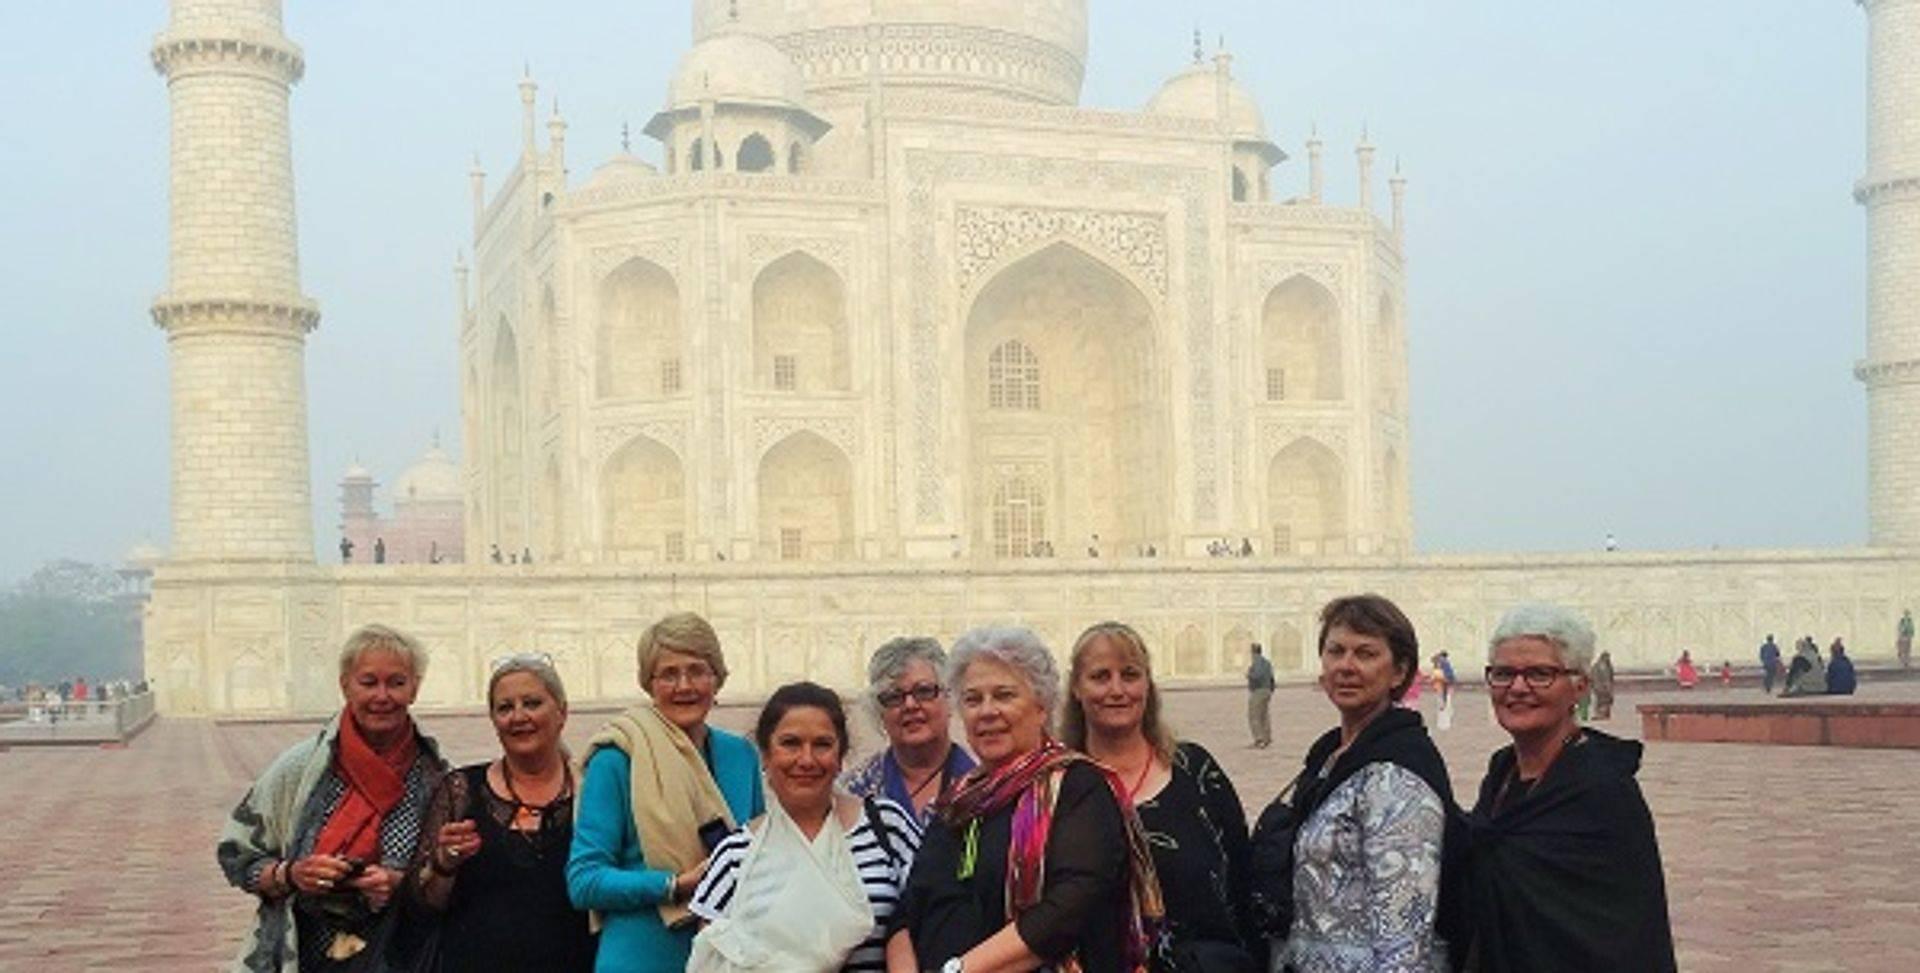 "<img src=""australian womens travel.jpg alt=womens tours, tour group in he morning in front of the taj mahal, india"">"